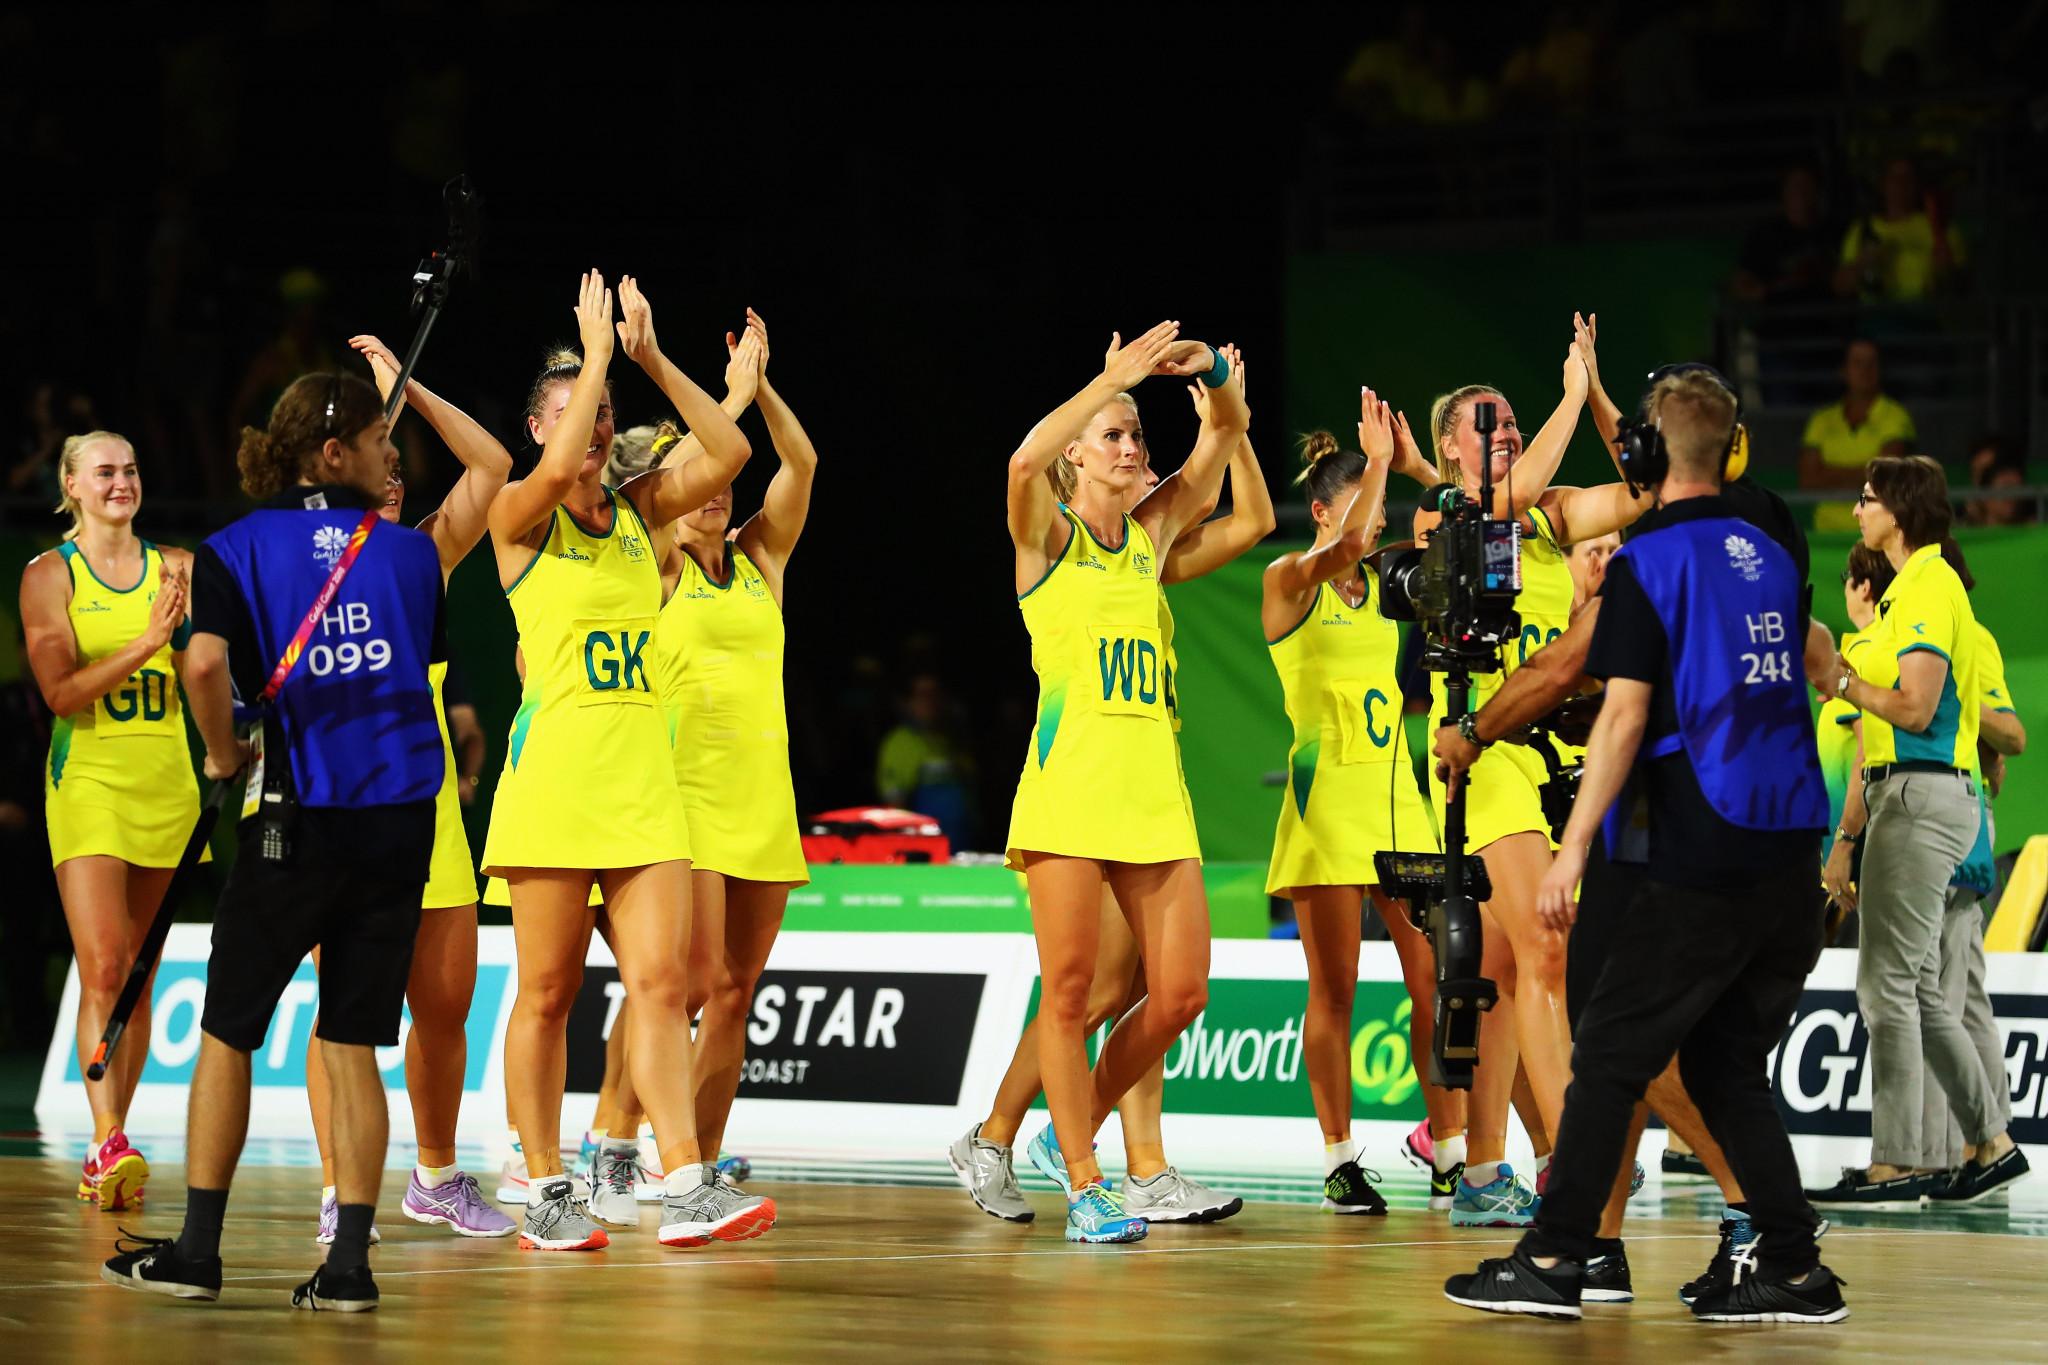 Australia remain top of netball world rankings despite Gold Coast silver